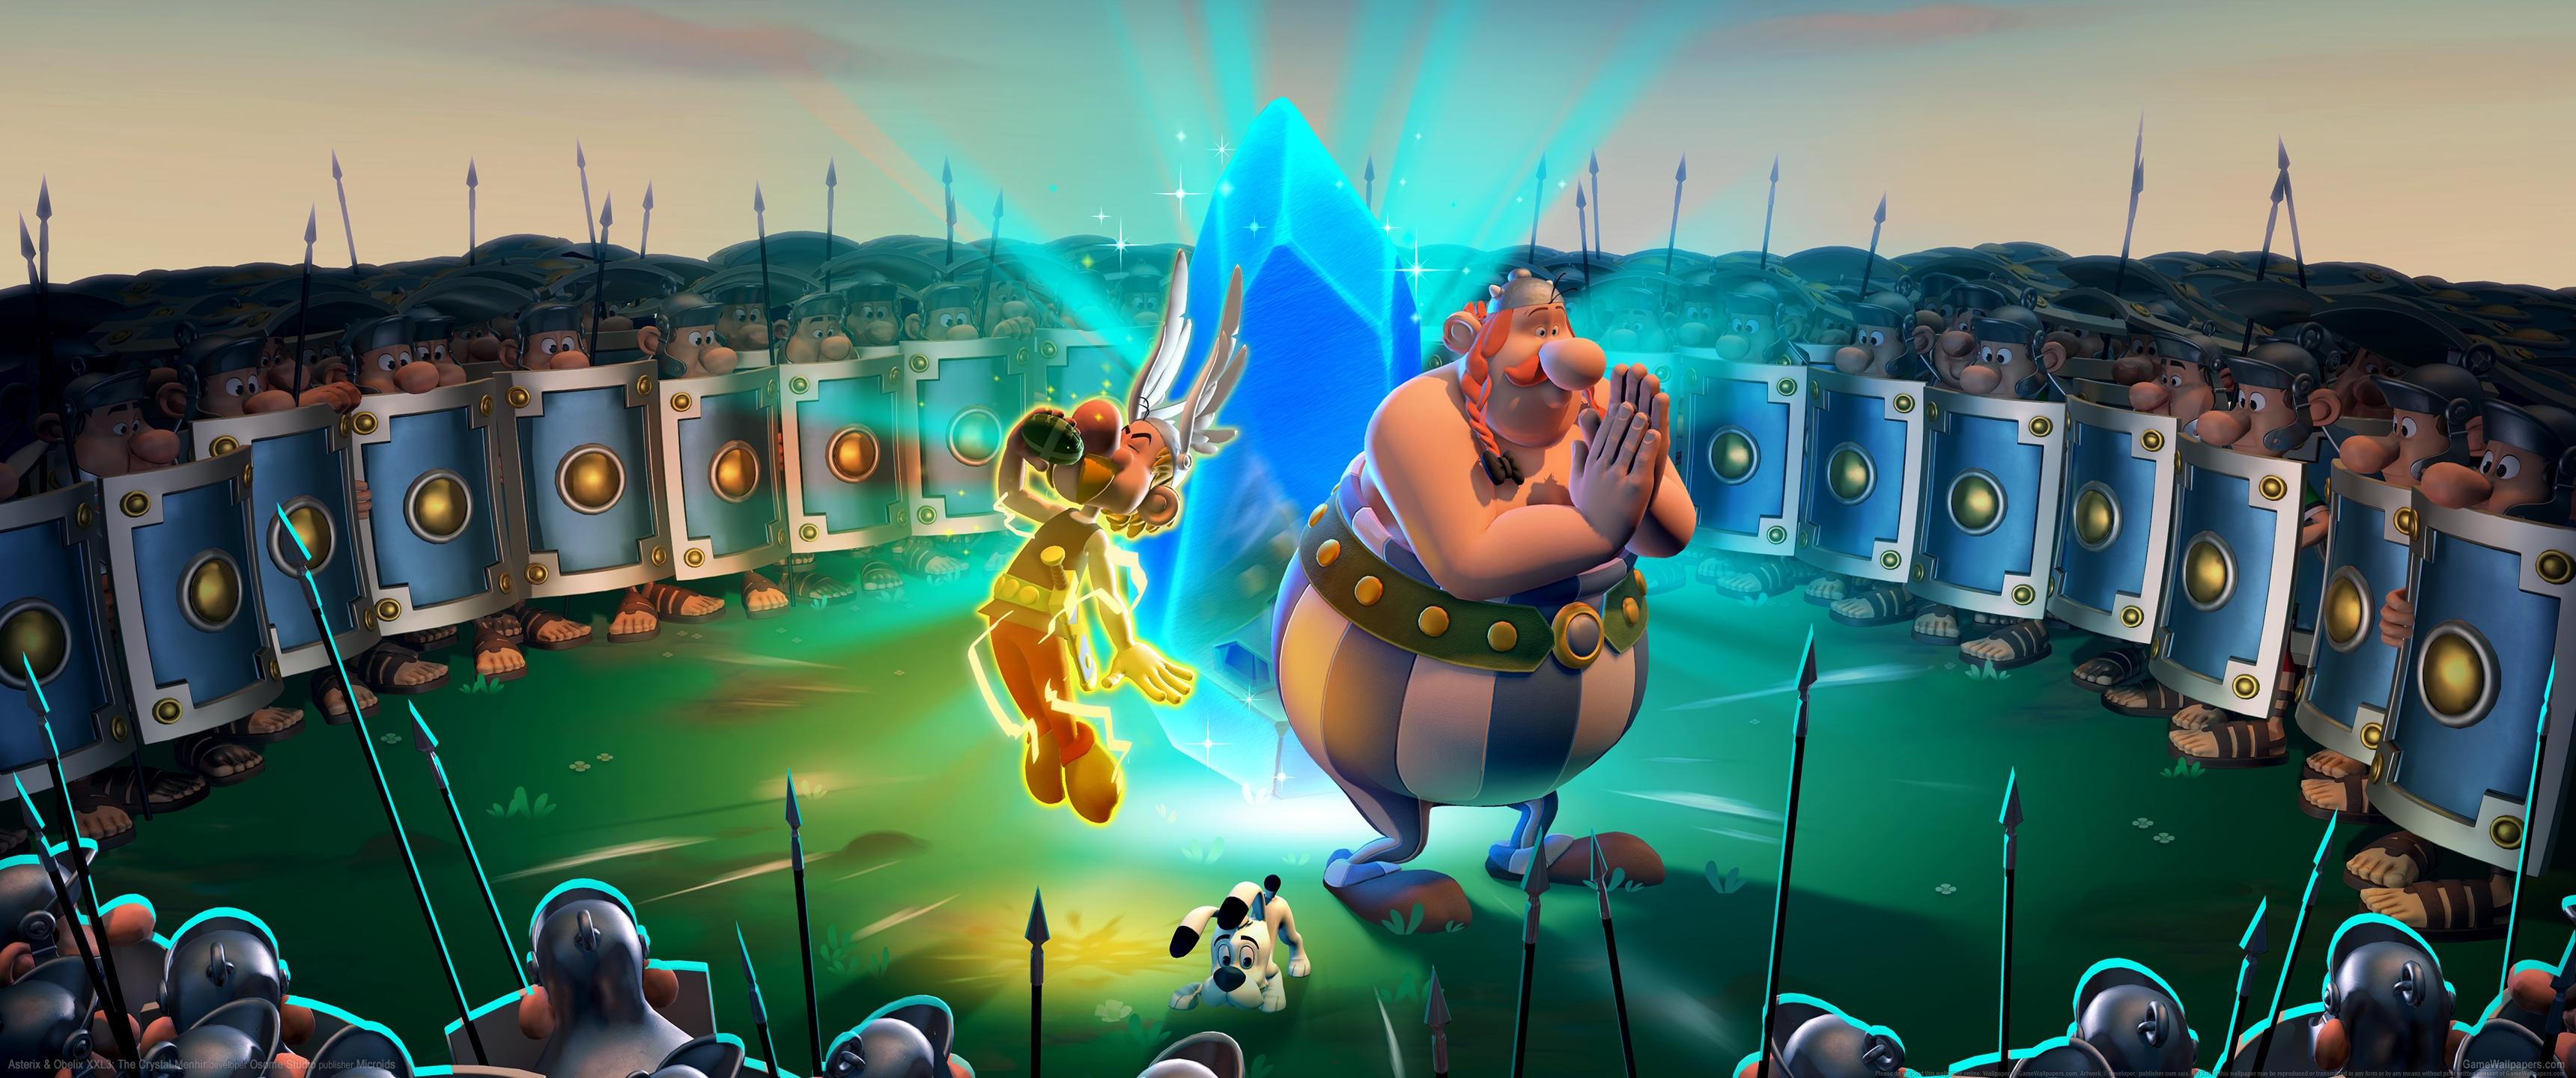 Asterix & Obelix XXL3: The Crystal Menhir 3440x1440 fondo de escritorio 01